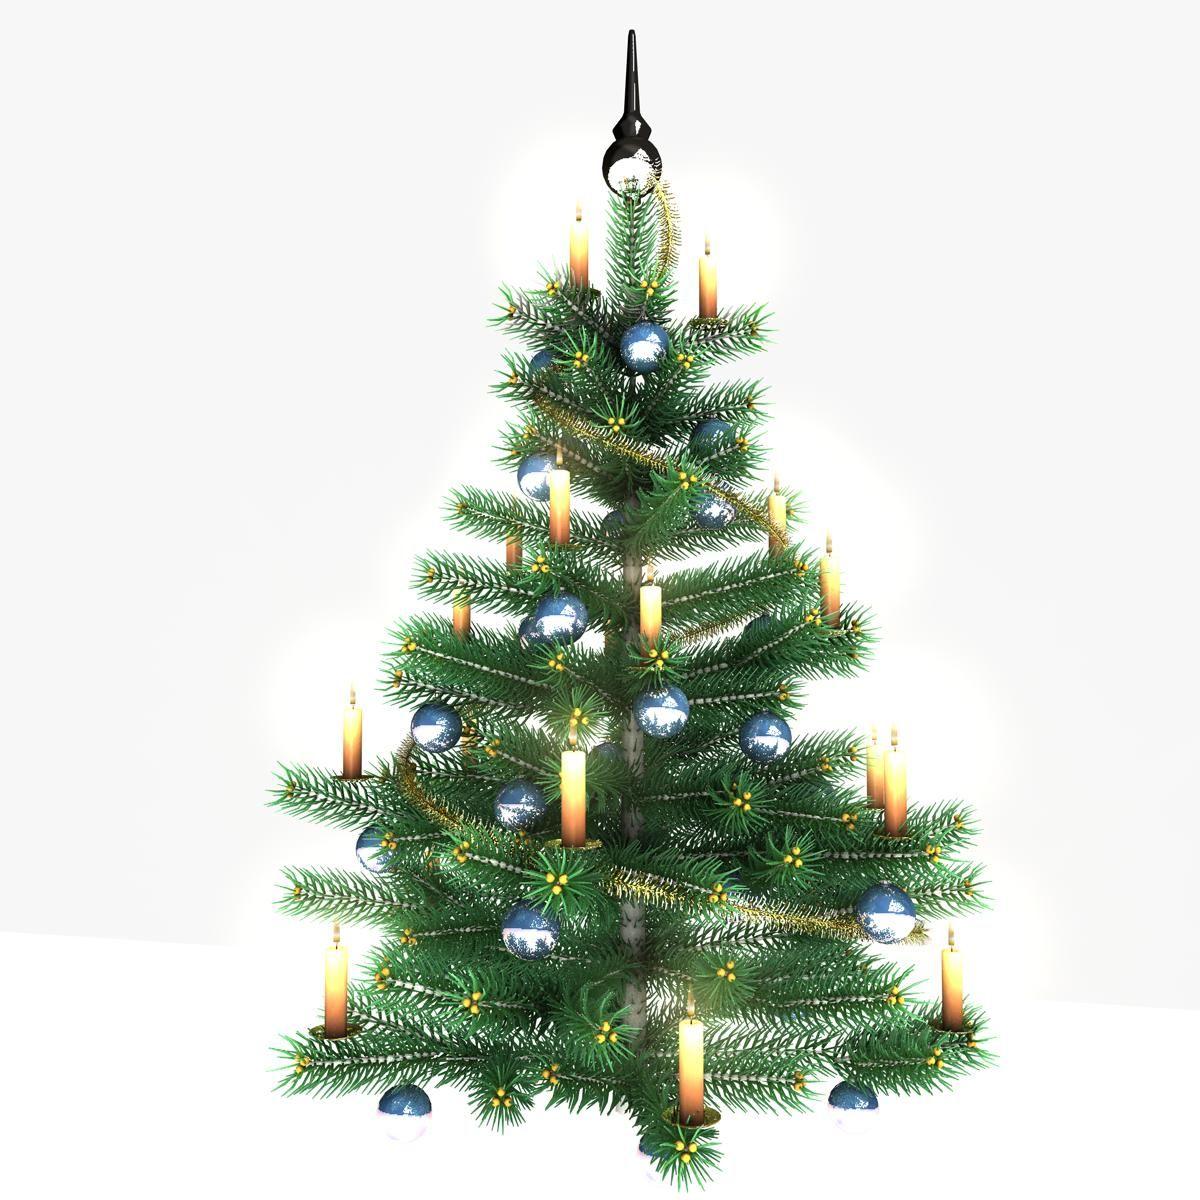 Christmas Tree Blue 3d Model Ad Tree Christmas Model Blue Christmas Tree Tree